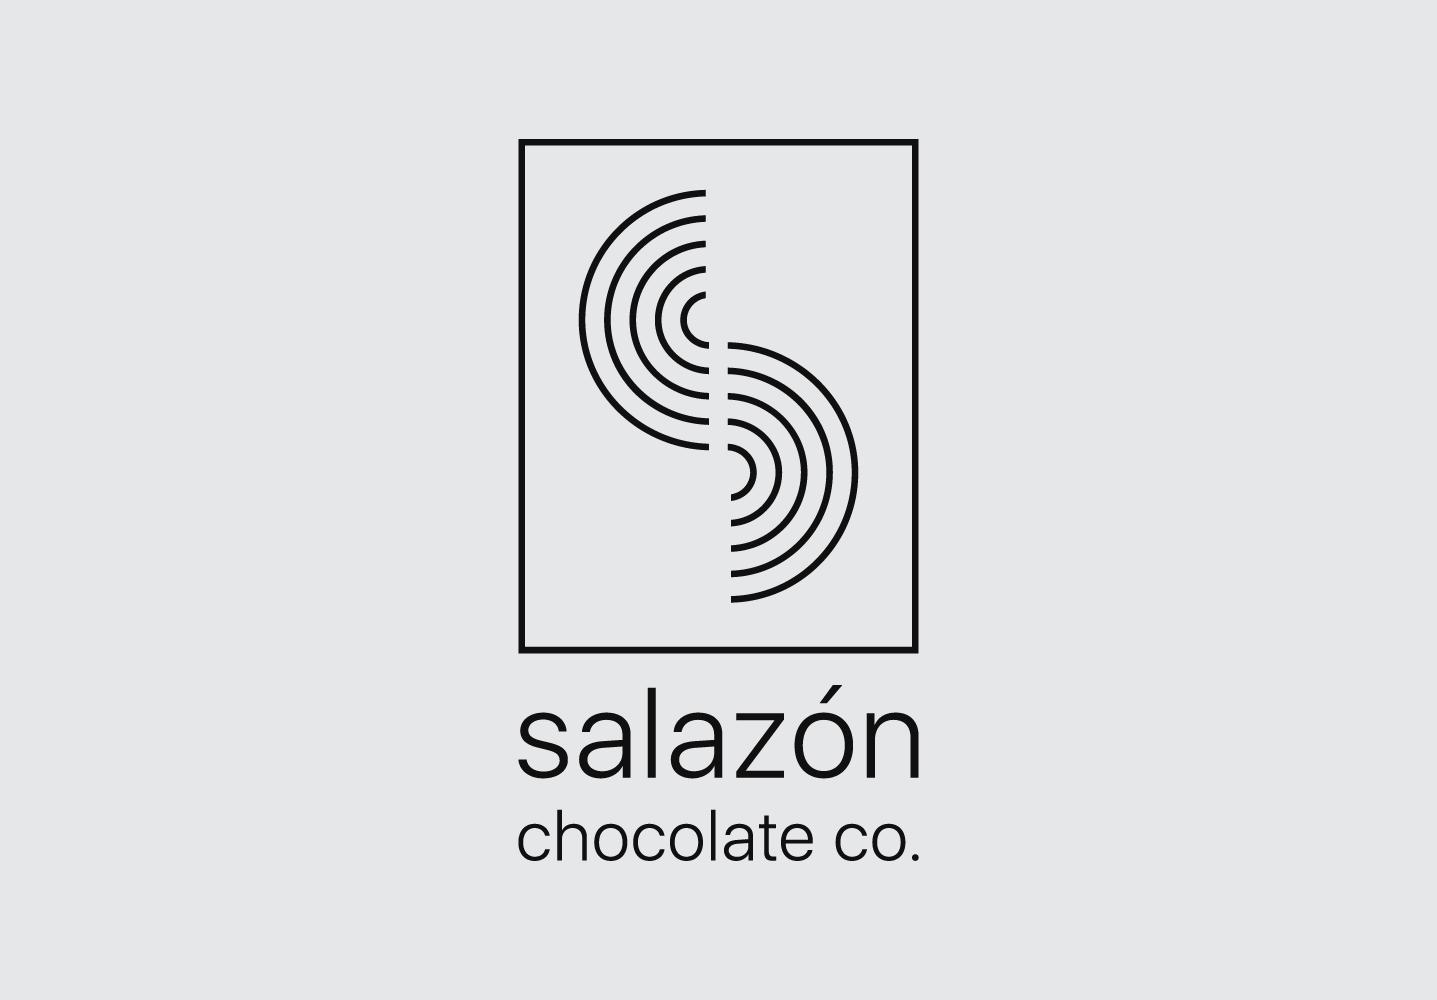 salazon-full-logo.jpg